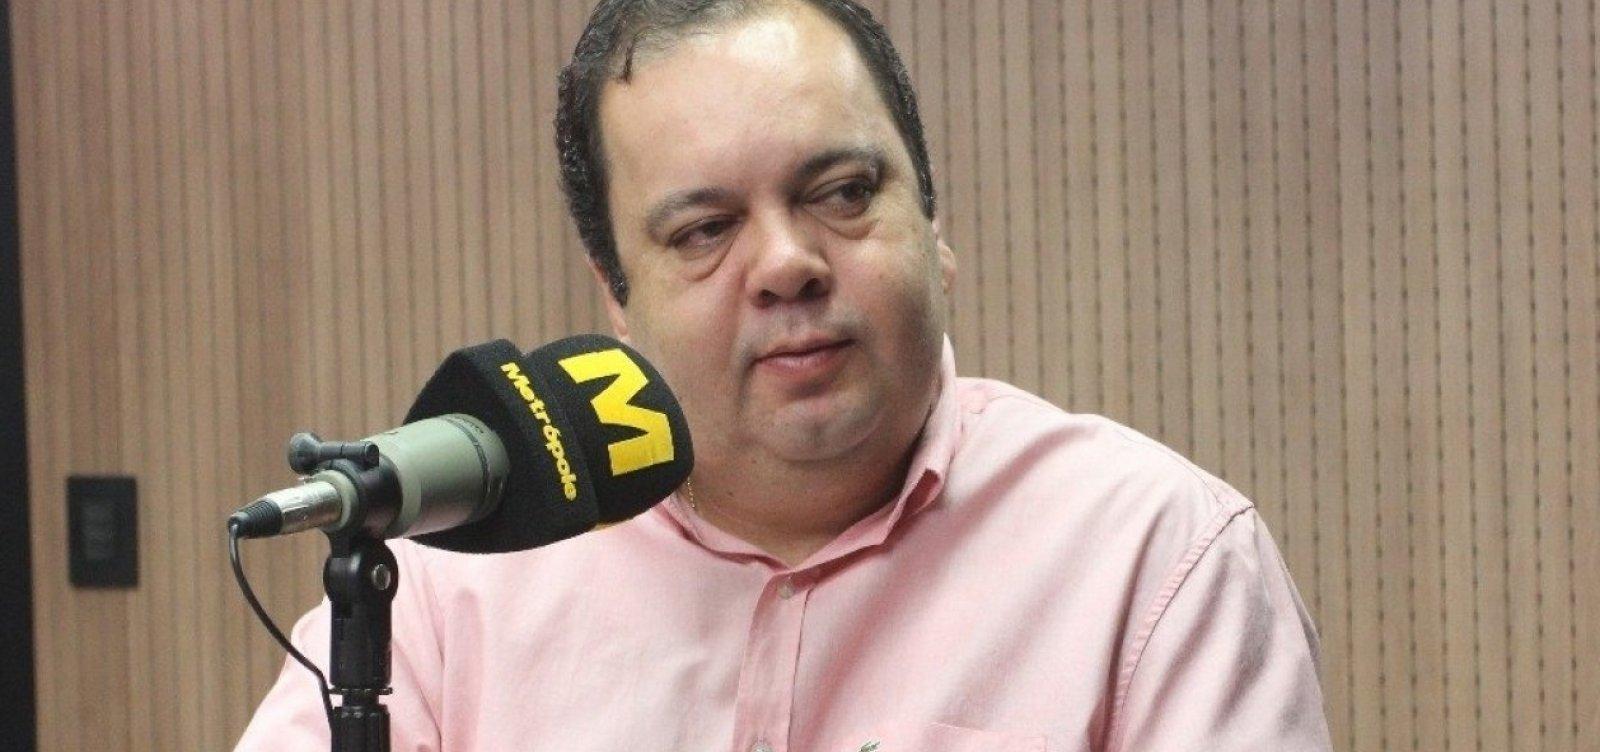 [Após chamar Bolsonaro de 'louco', deputado baiano lidera bloco do governo]